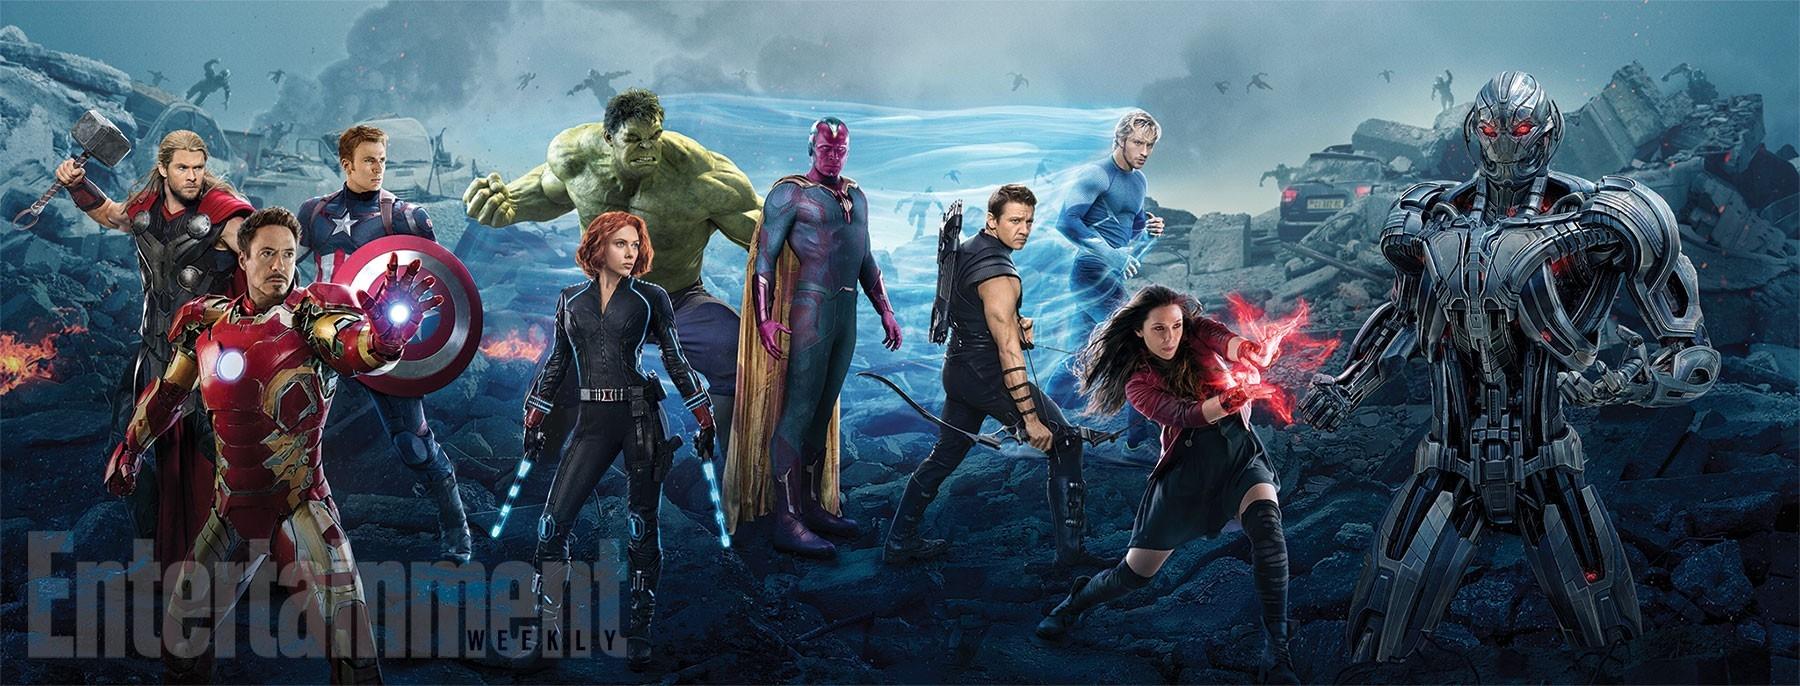 original_avengers-age-of-ultron-movie-ew-banner.jpg